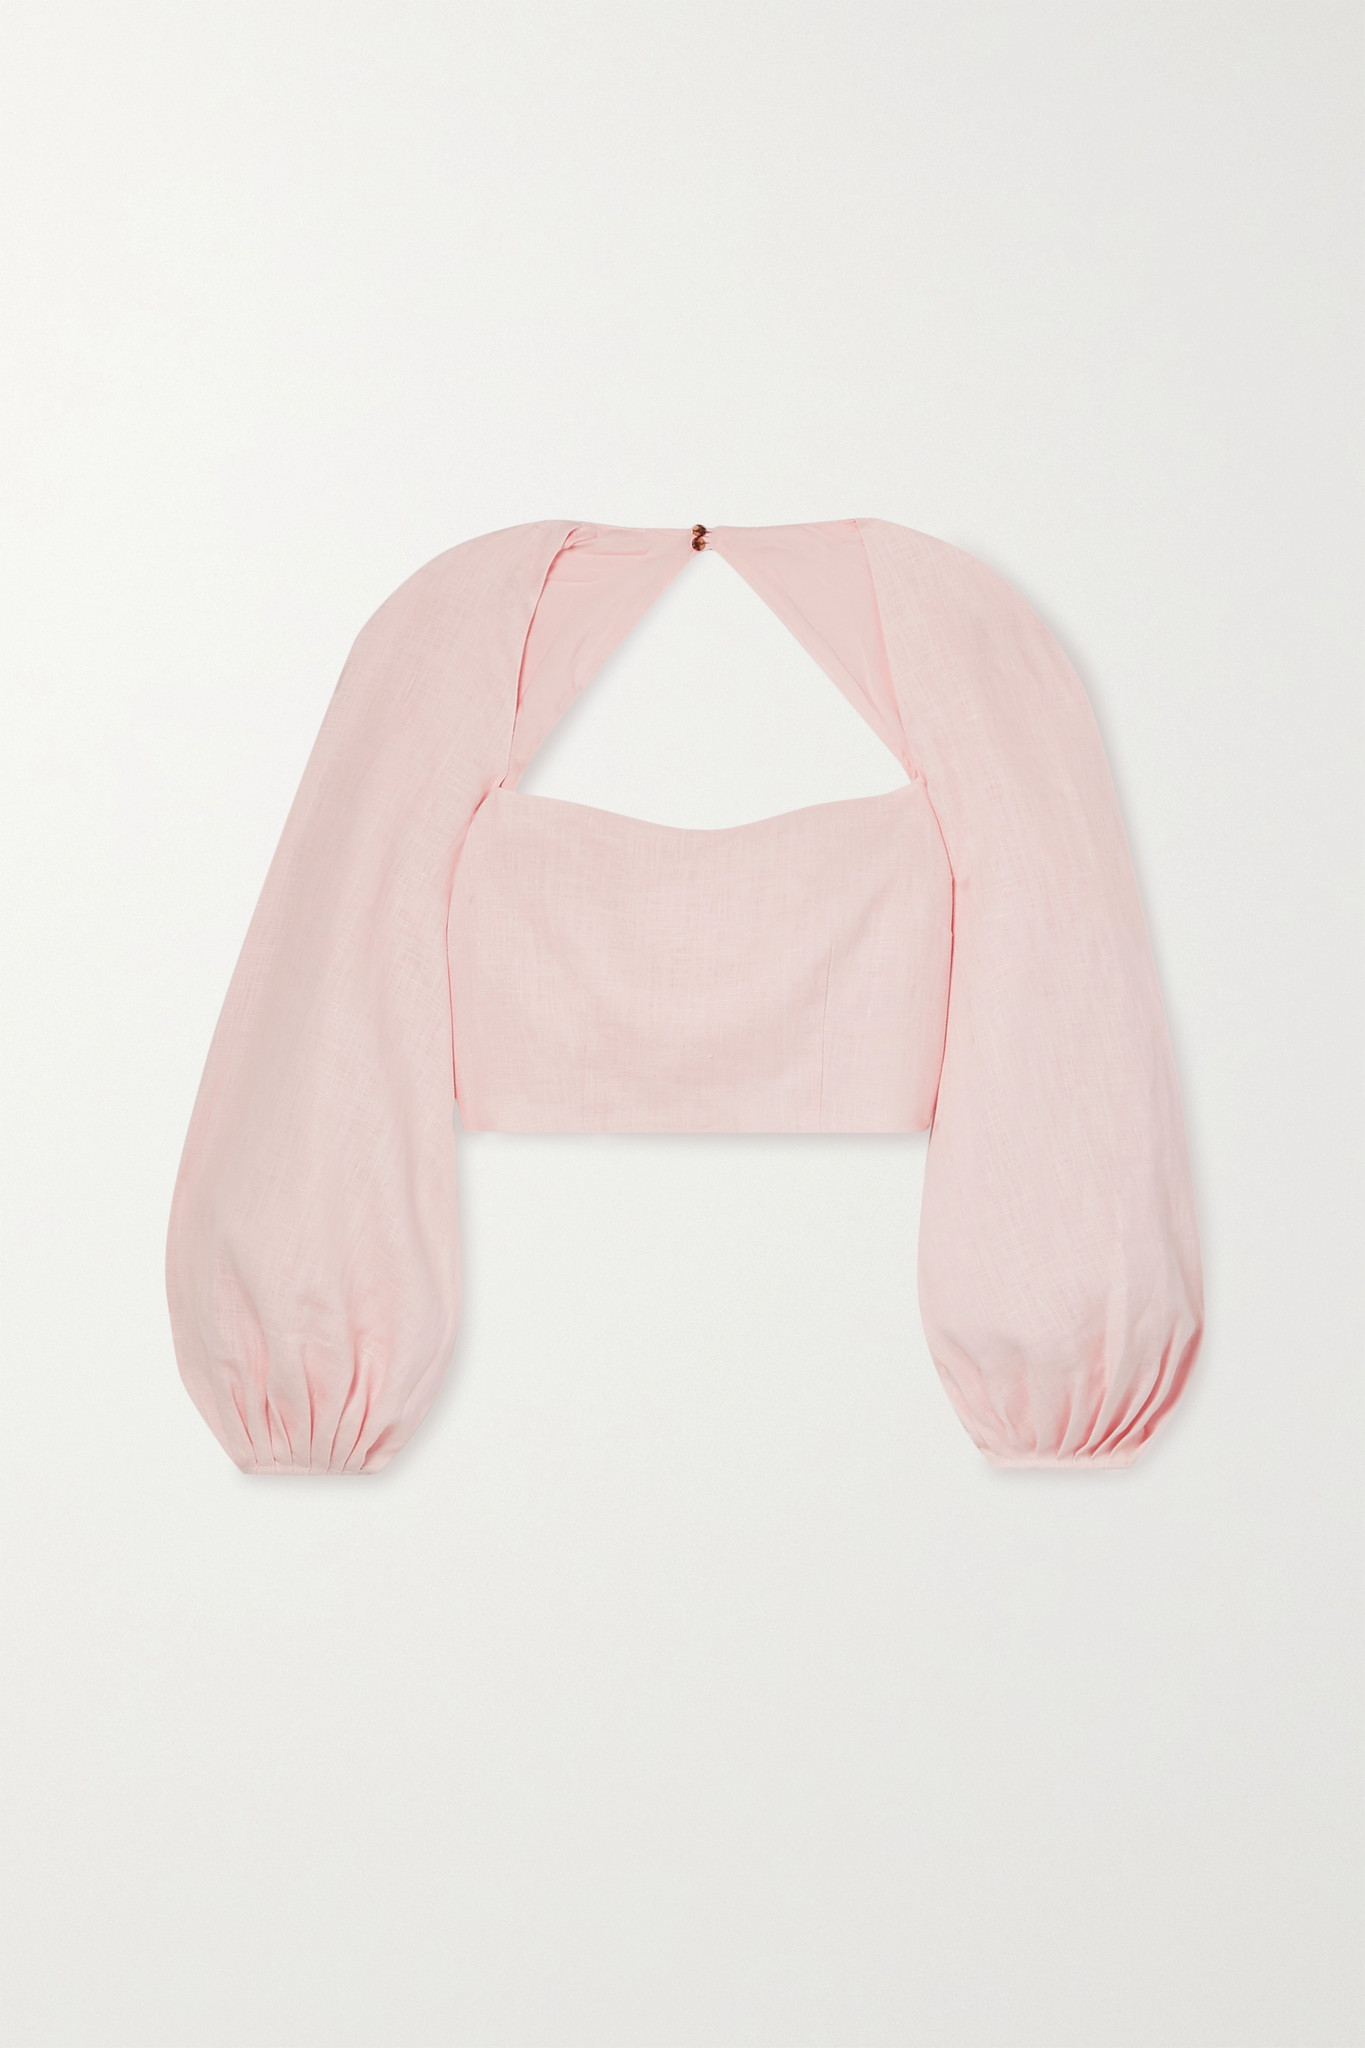 MARA HOFFMAN - 【net Sustain】moon 挖剪汉麻短款上衣 - 粉红色 - US00